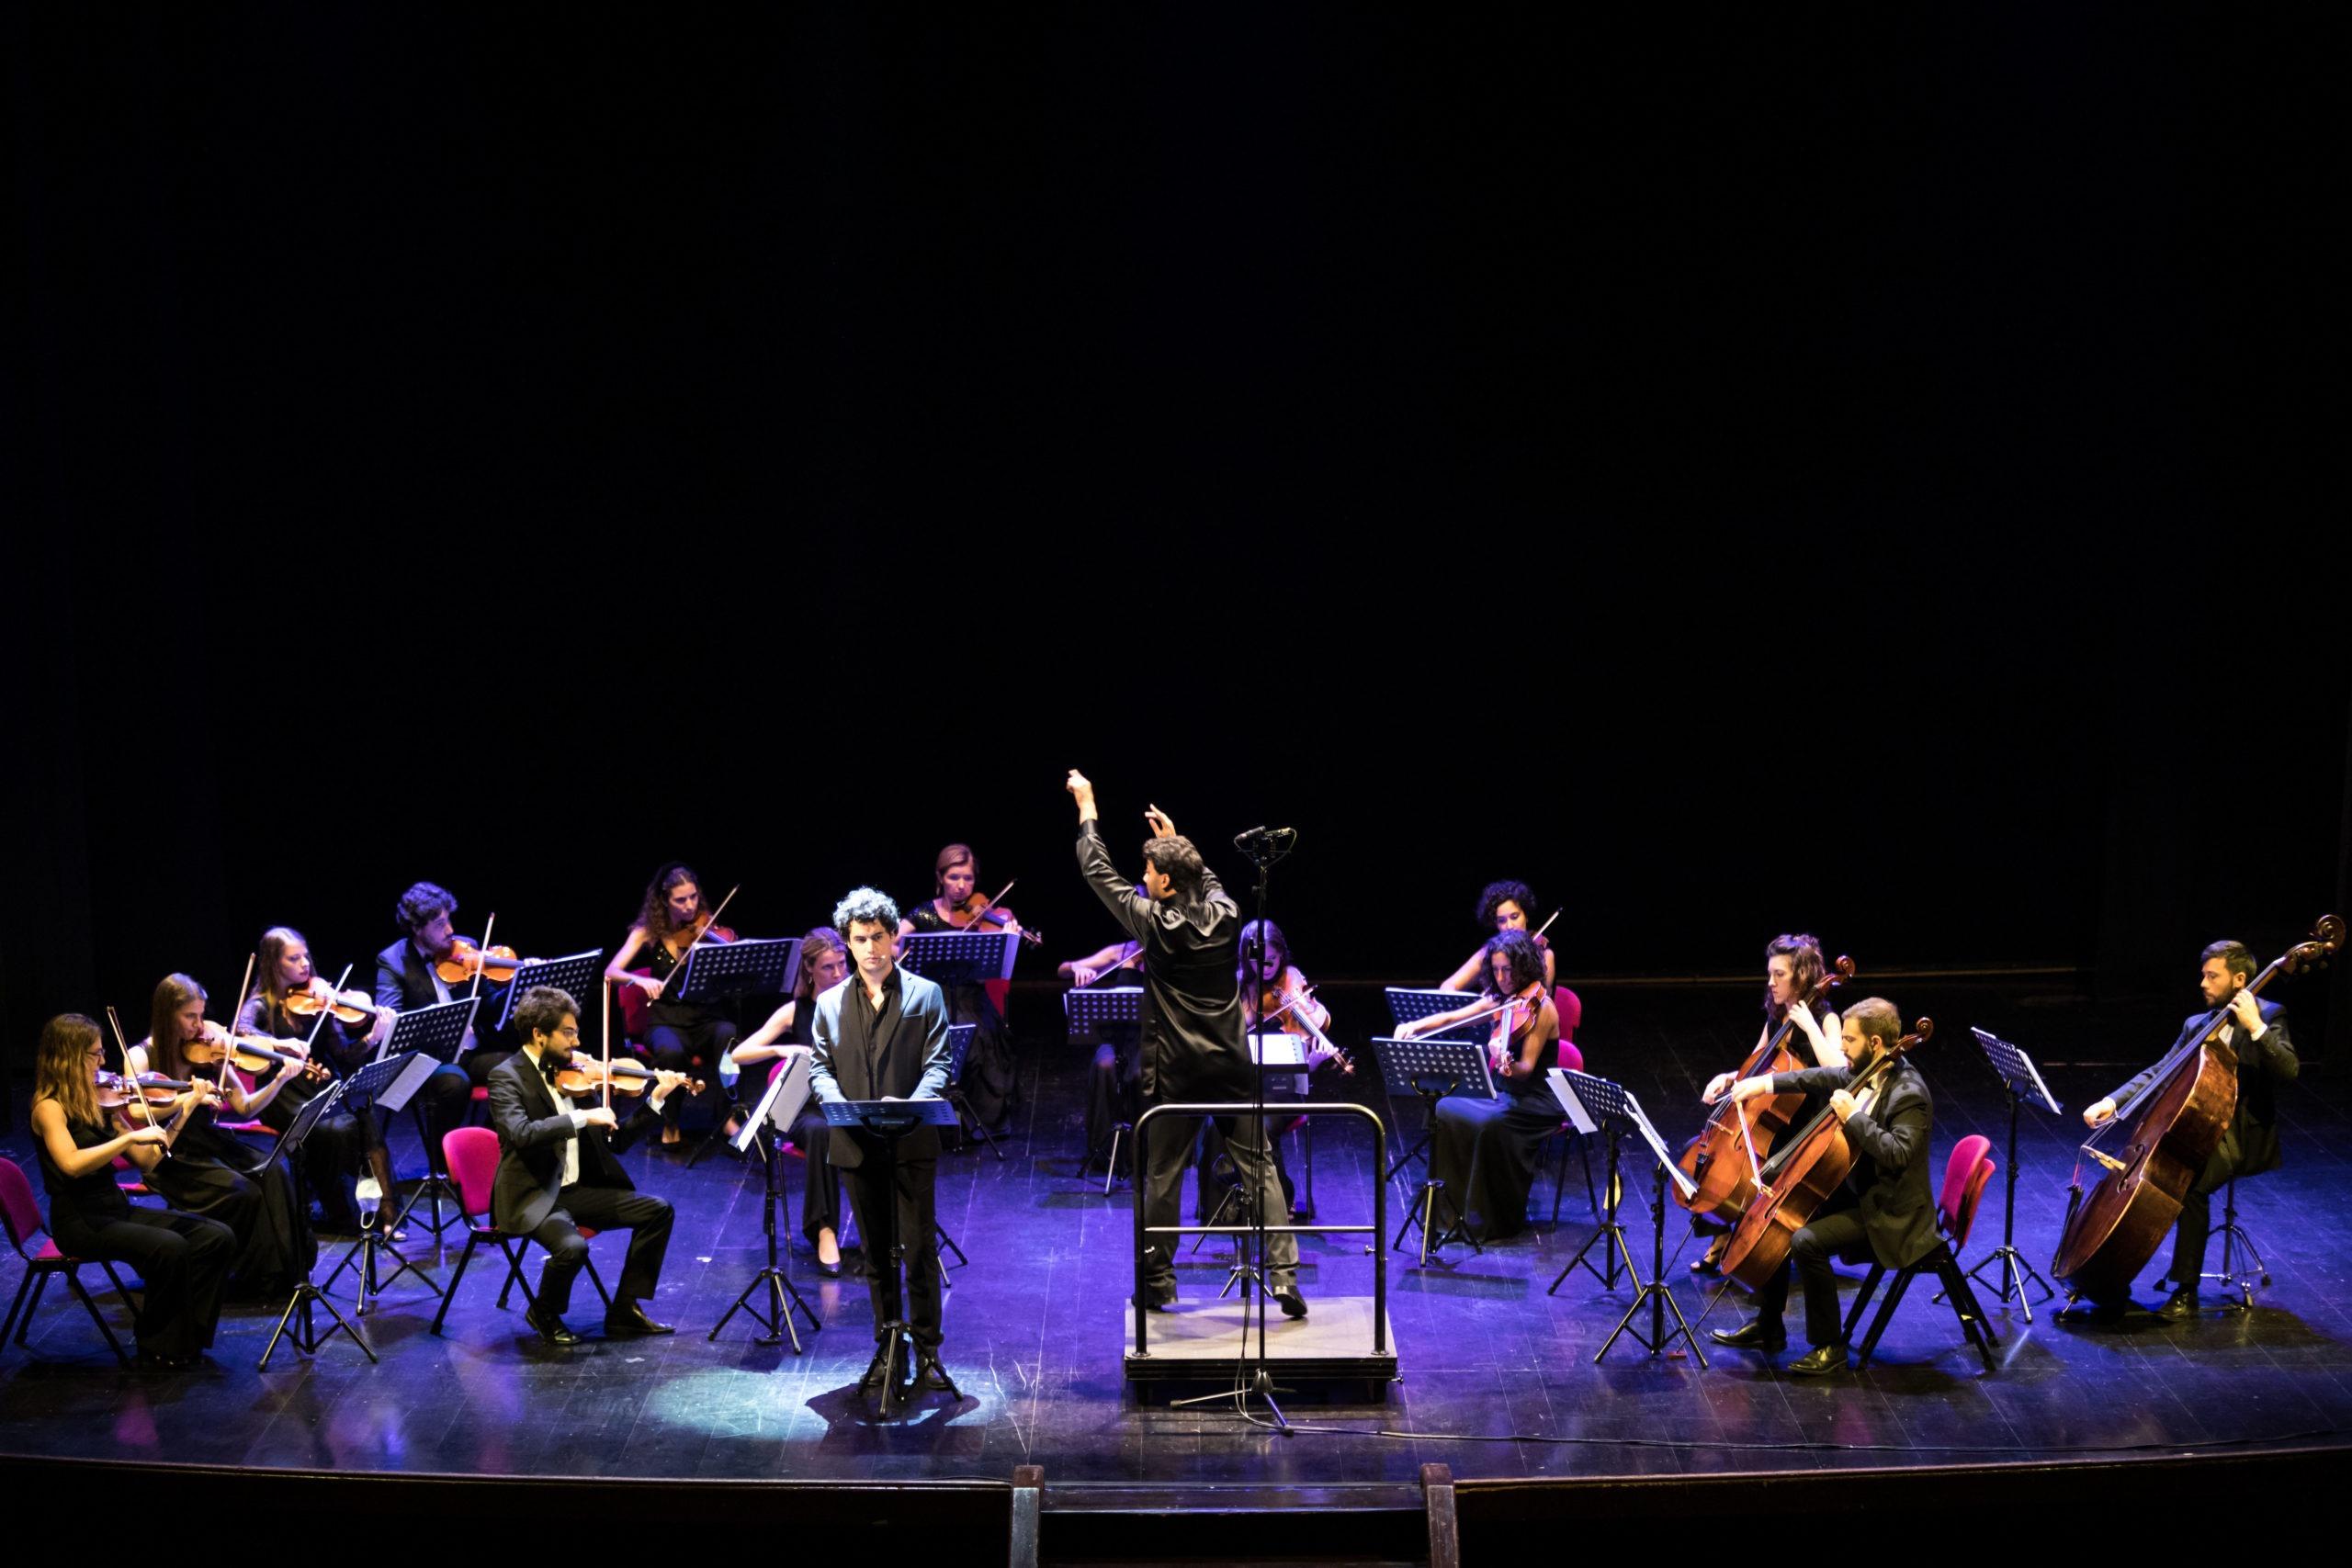 orchestra-calamani-hossein-pishkar